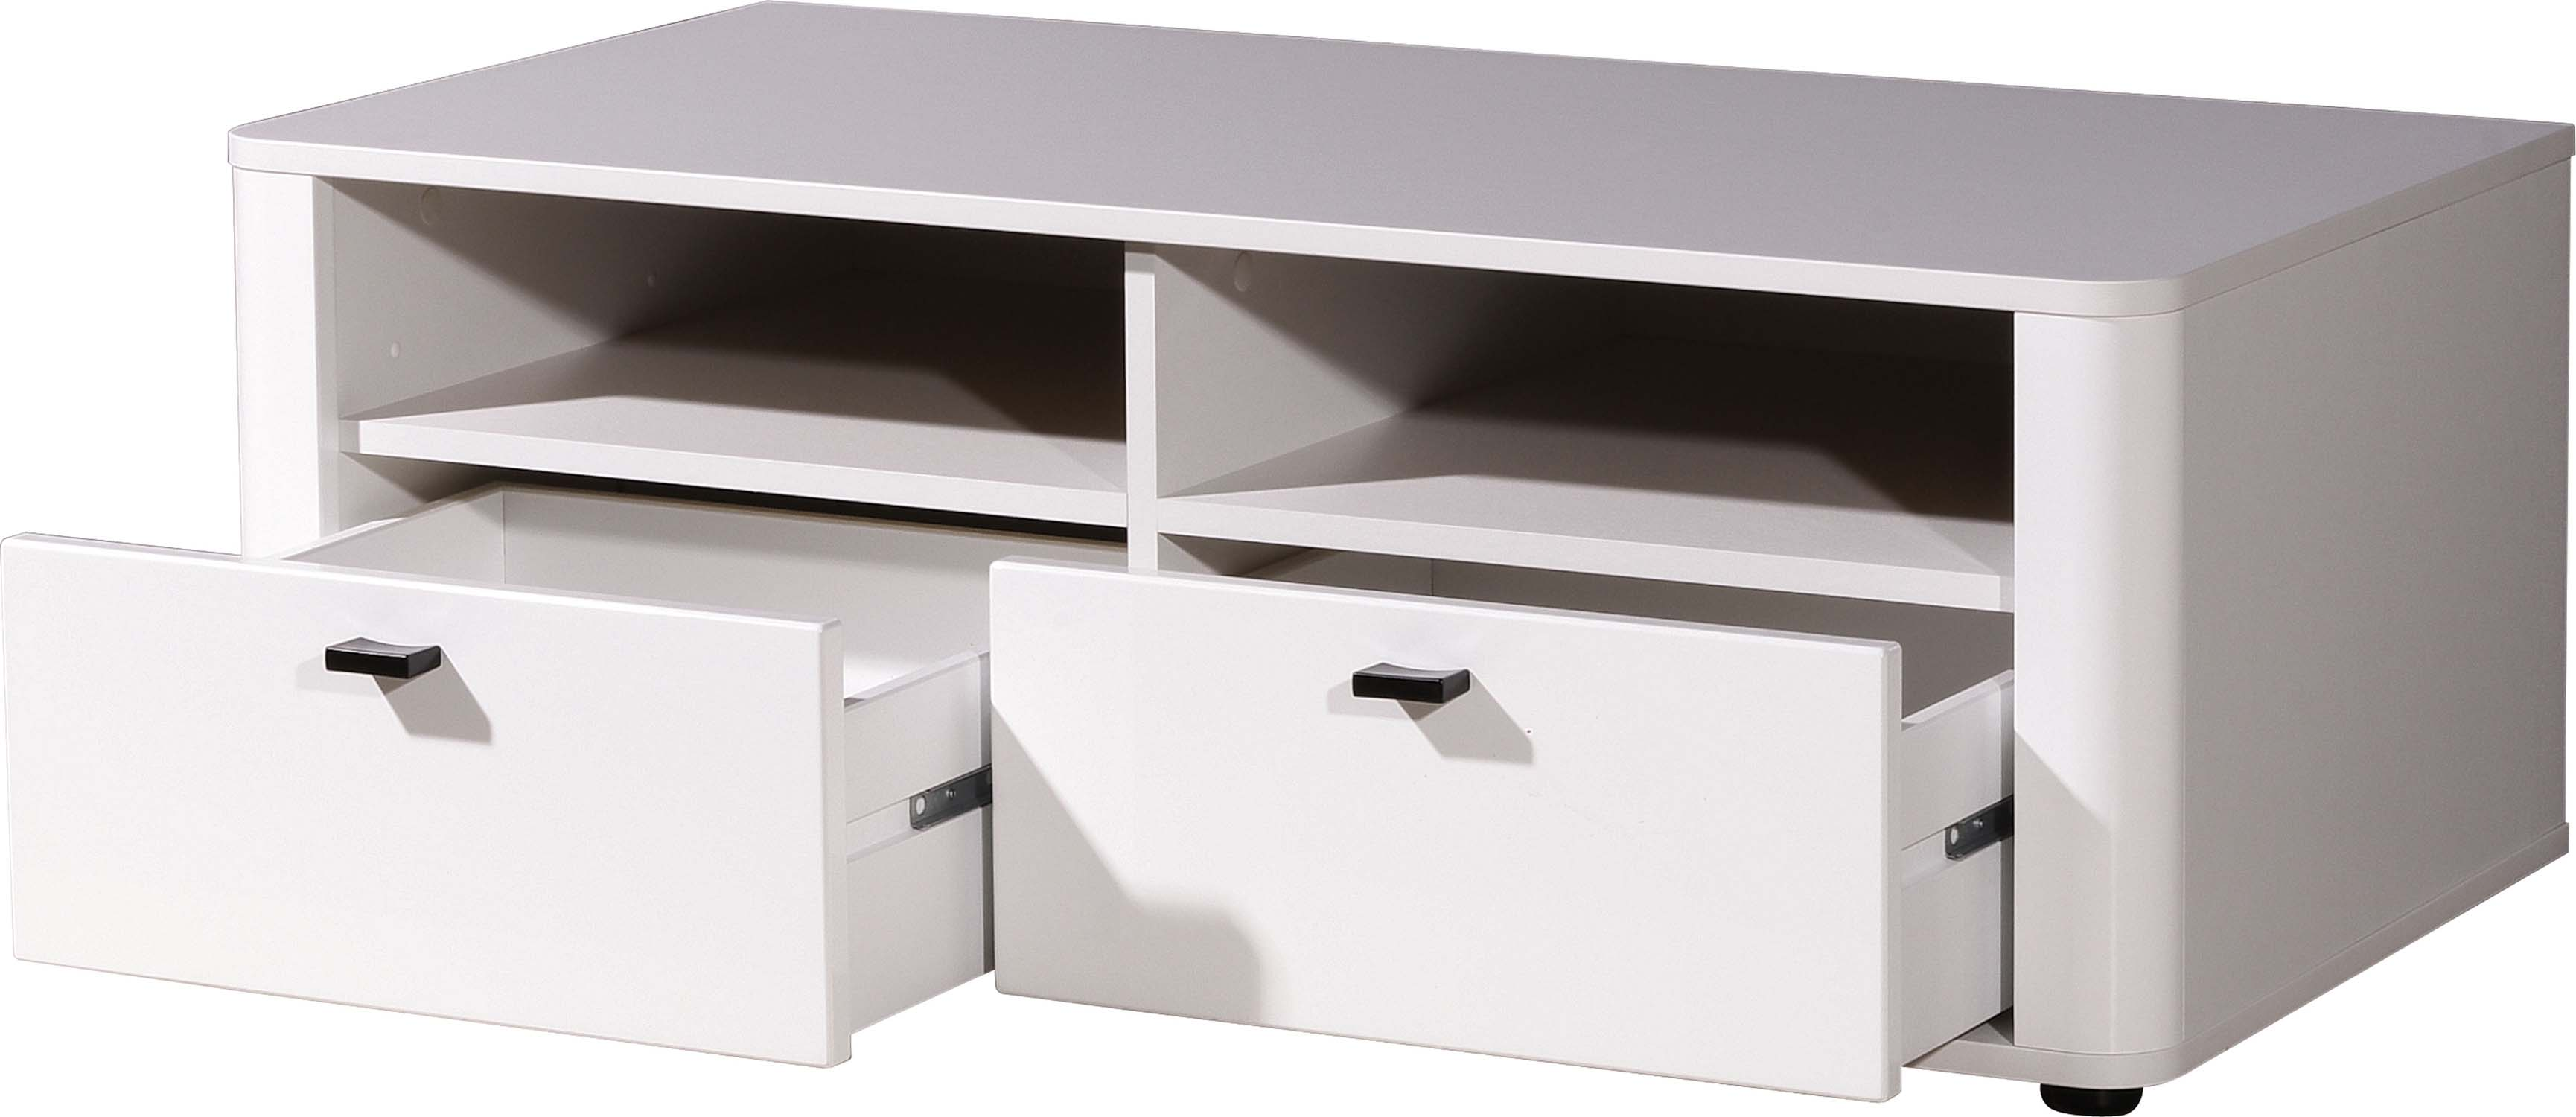 4tlg wohnwand anbauwand vitrine tv lowboard wandboard mod. Black Bedroom Furniture Sets. Home Design Ideas